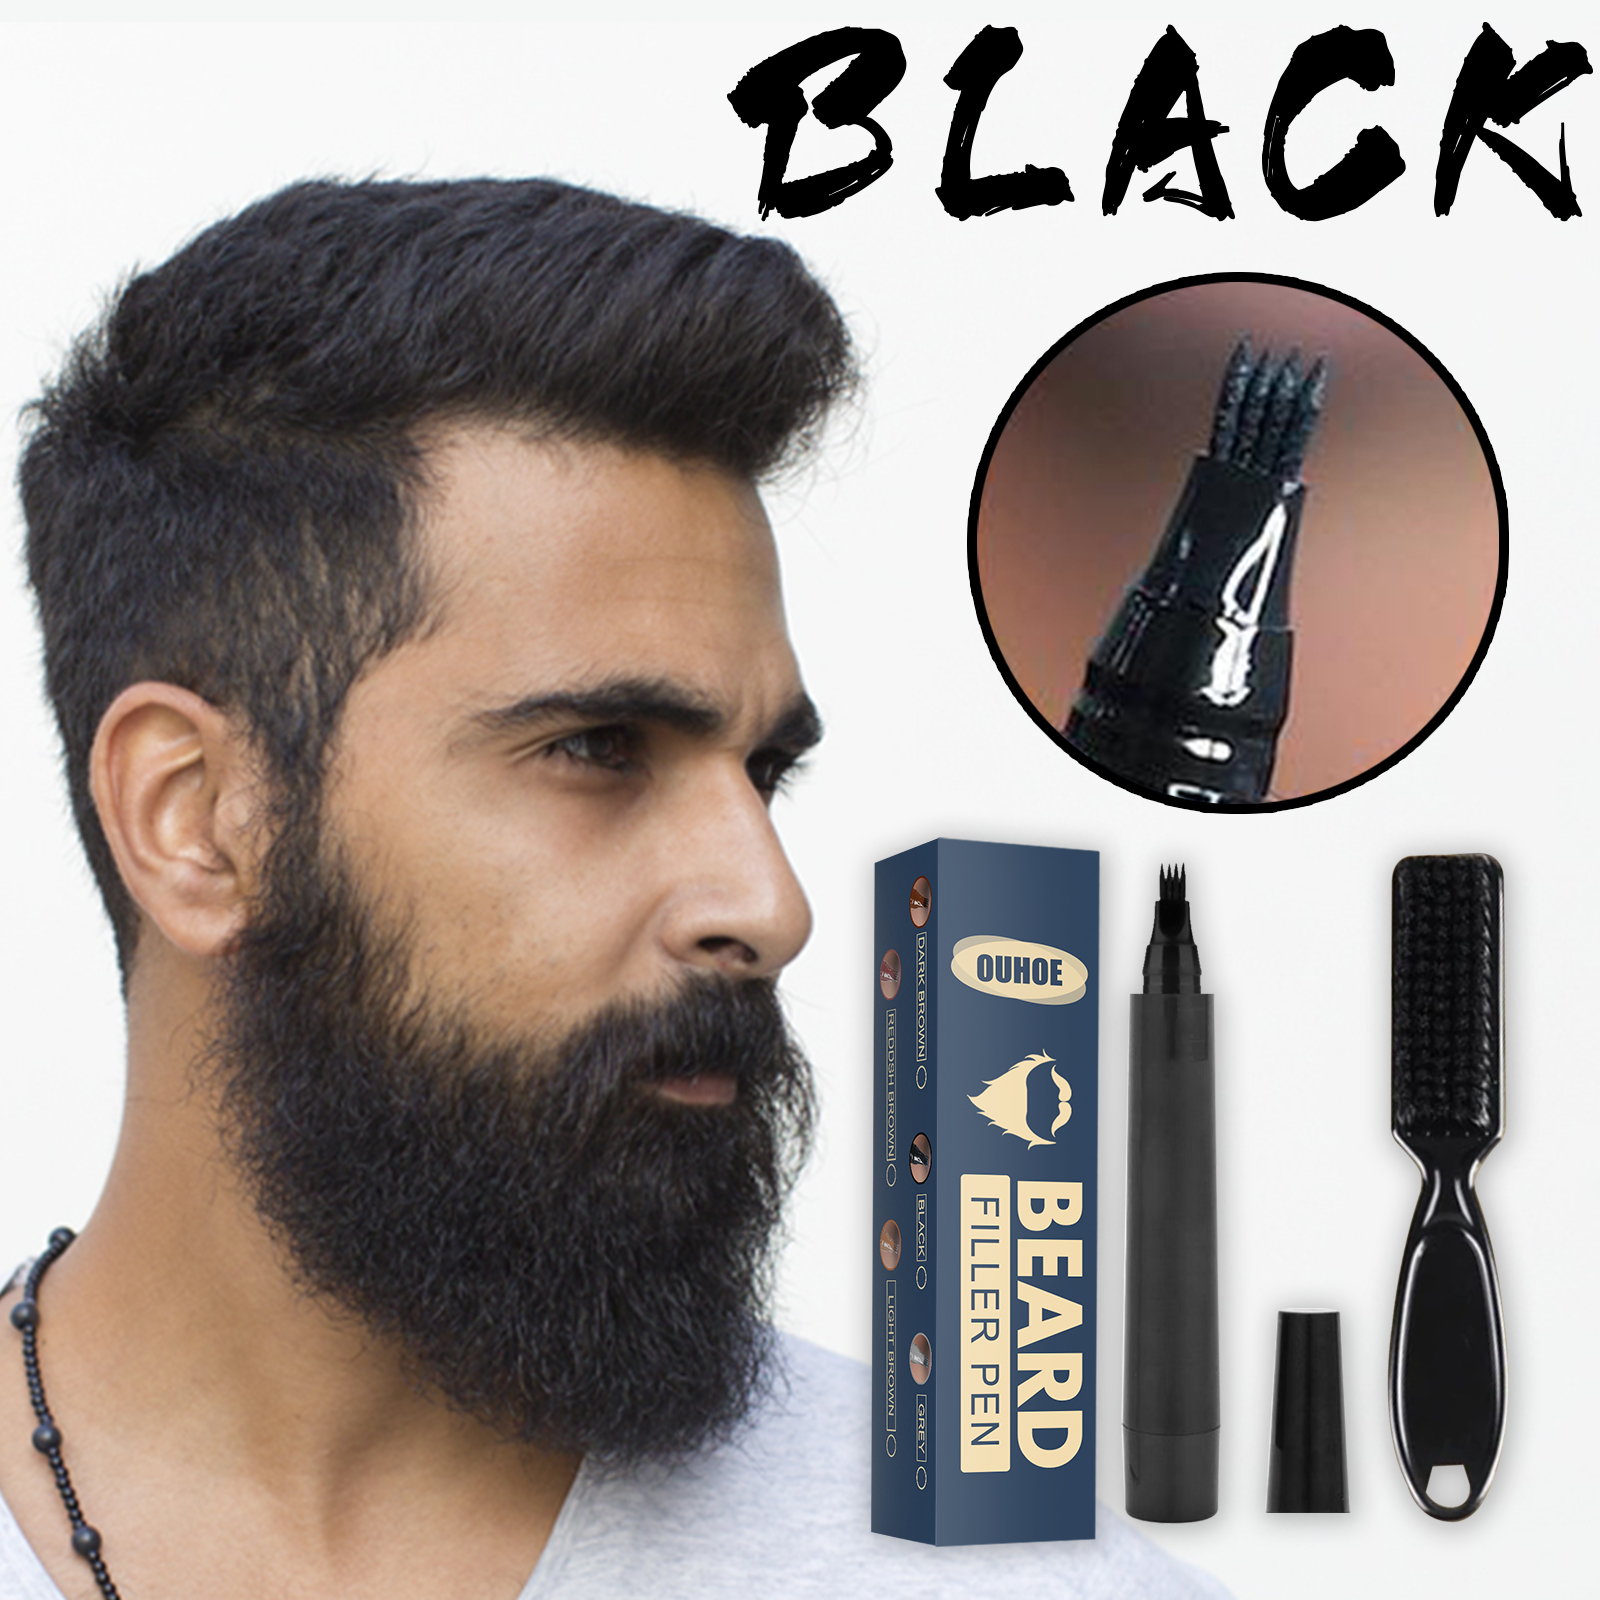 Beard Pencil Filler Beard Filling Pen Kit Barber Pencil With Brush Salon Facial Hair Styling Eyebrow